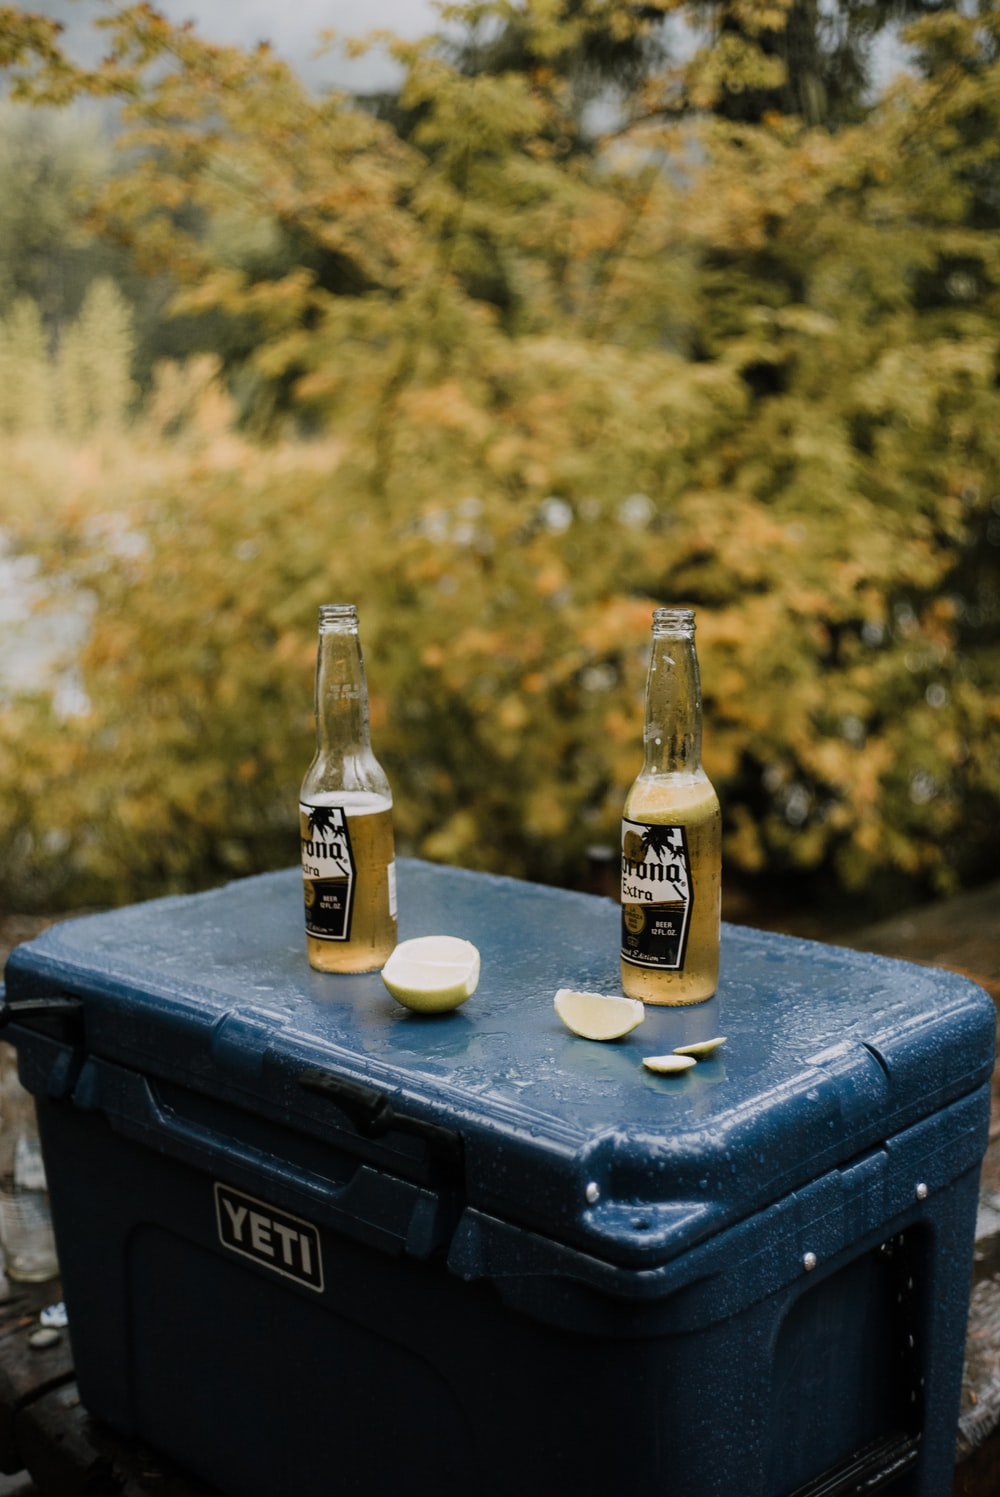 corona extra beer bottle on black wooden table